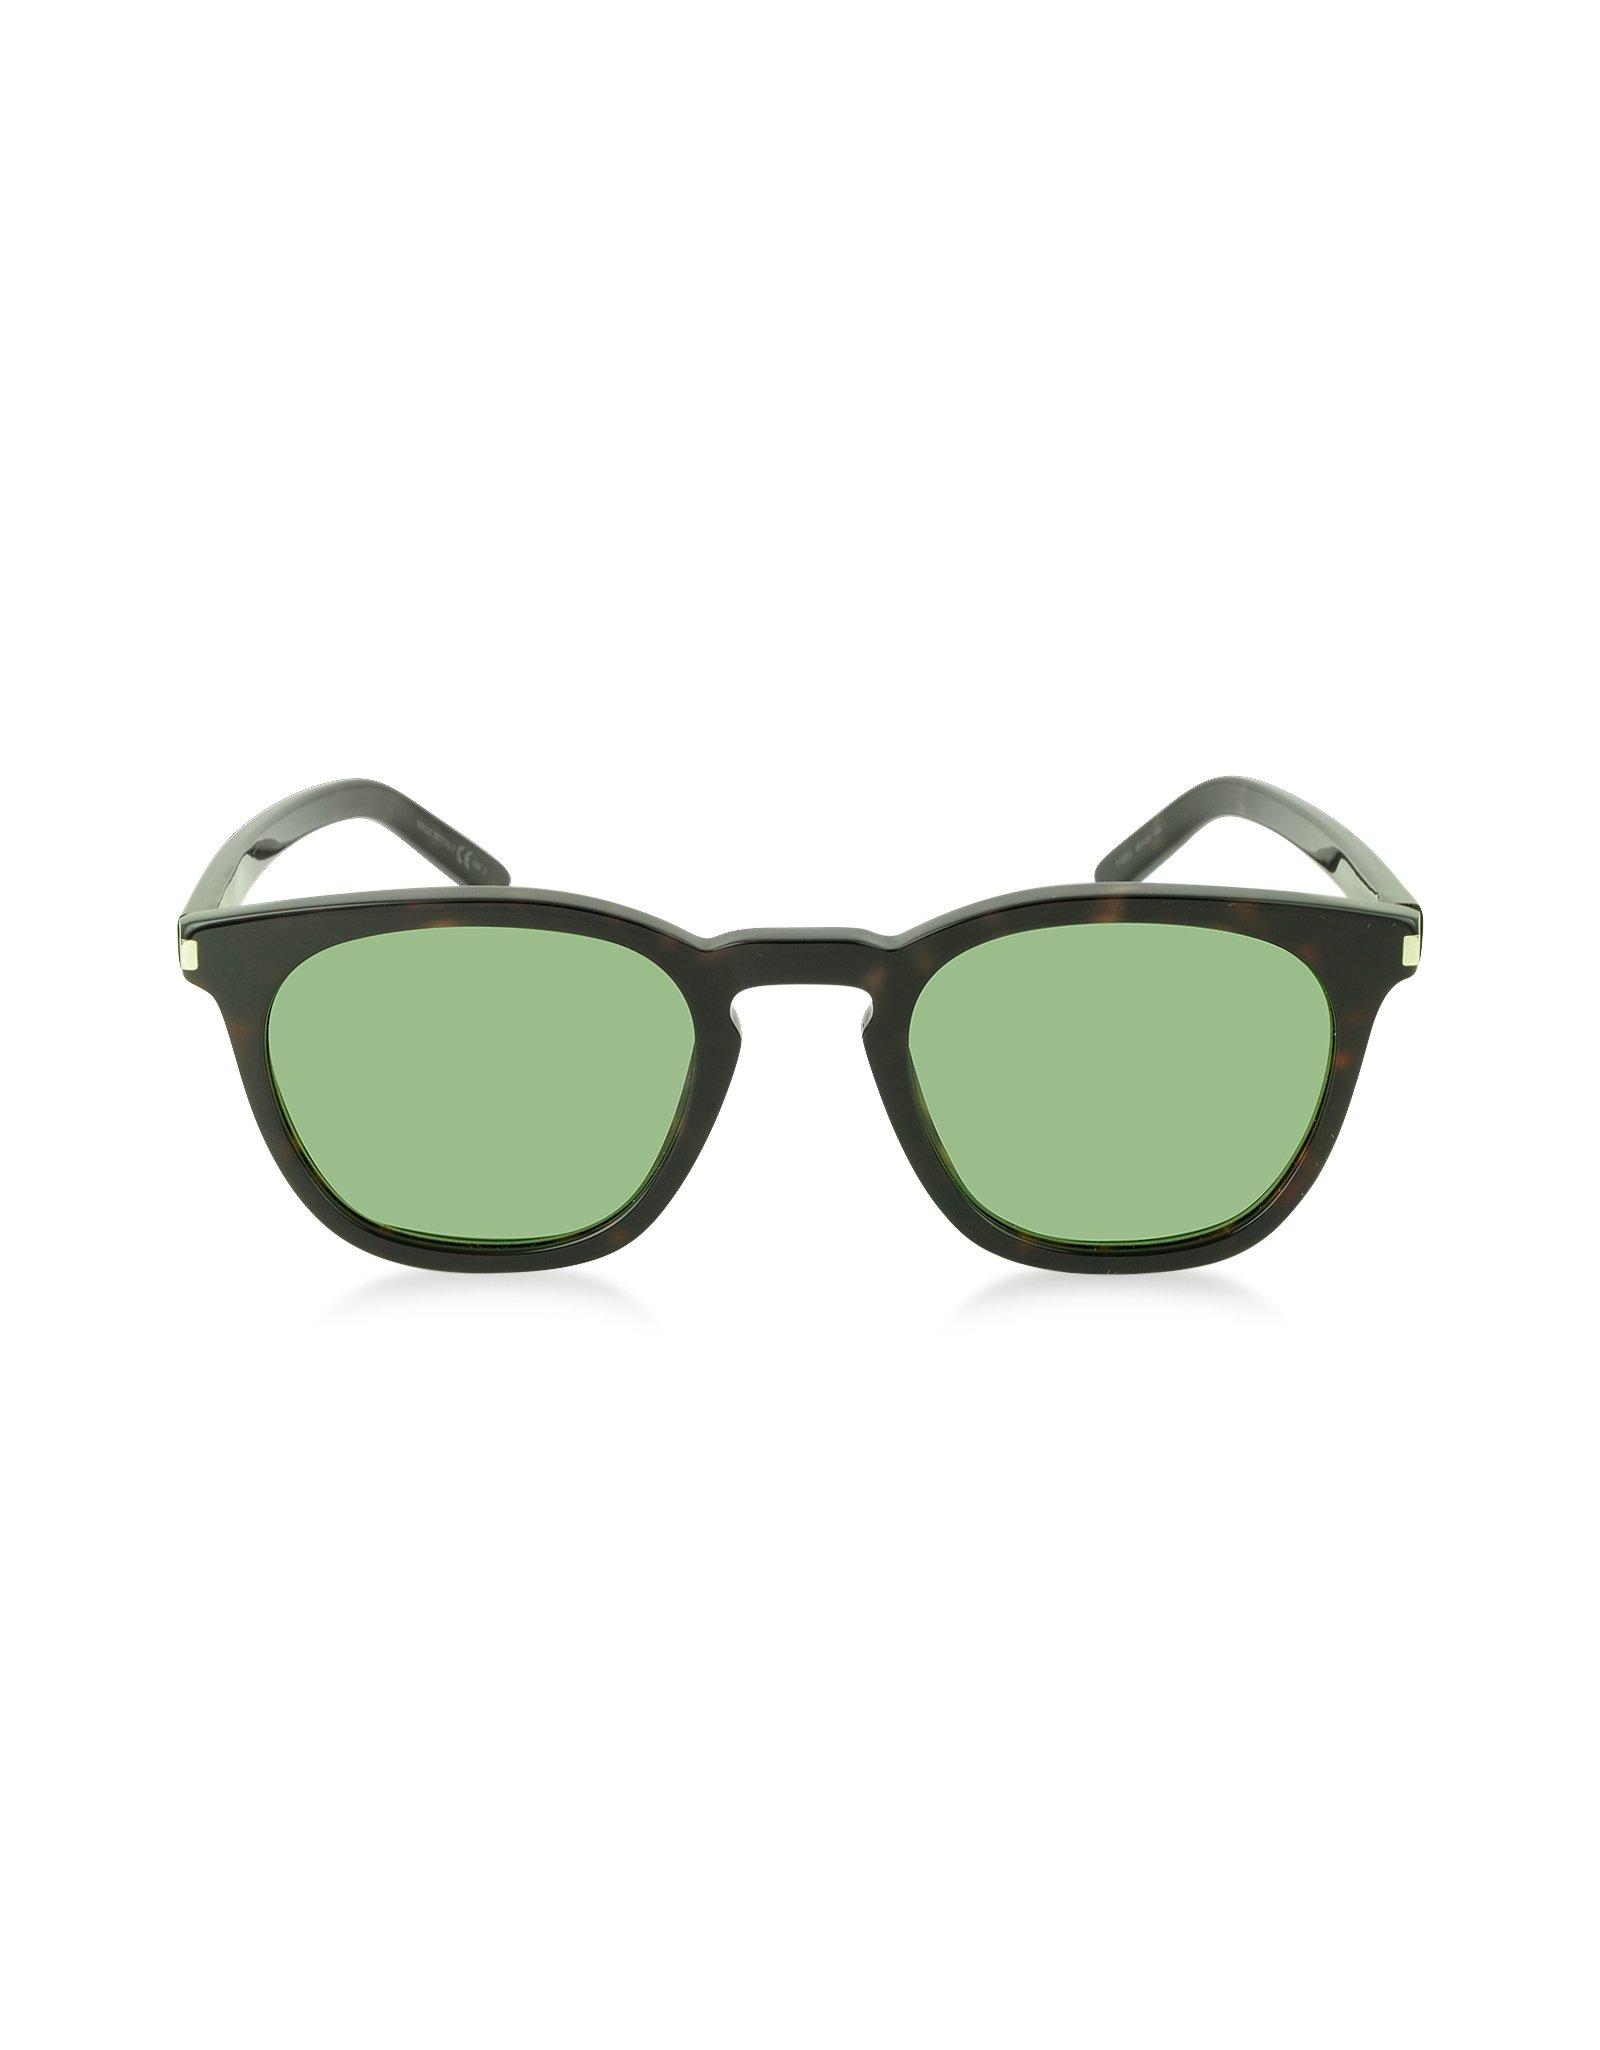 3dc92ed2266 Saint laurent Sl 28 Acetate Men  39 S Sunglasses in Green for Men